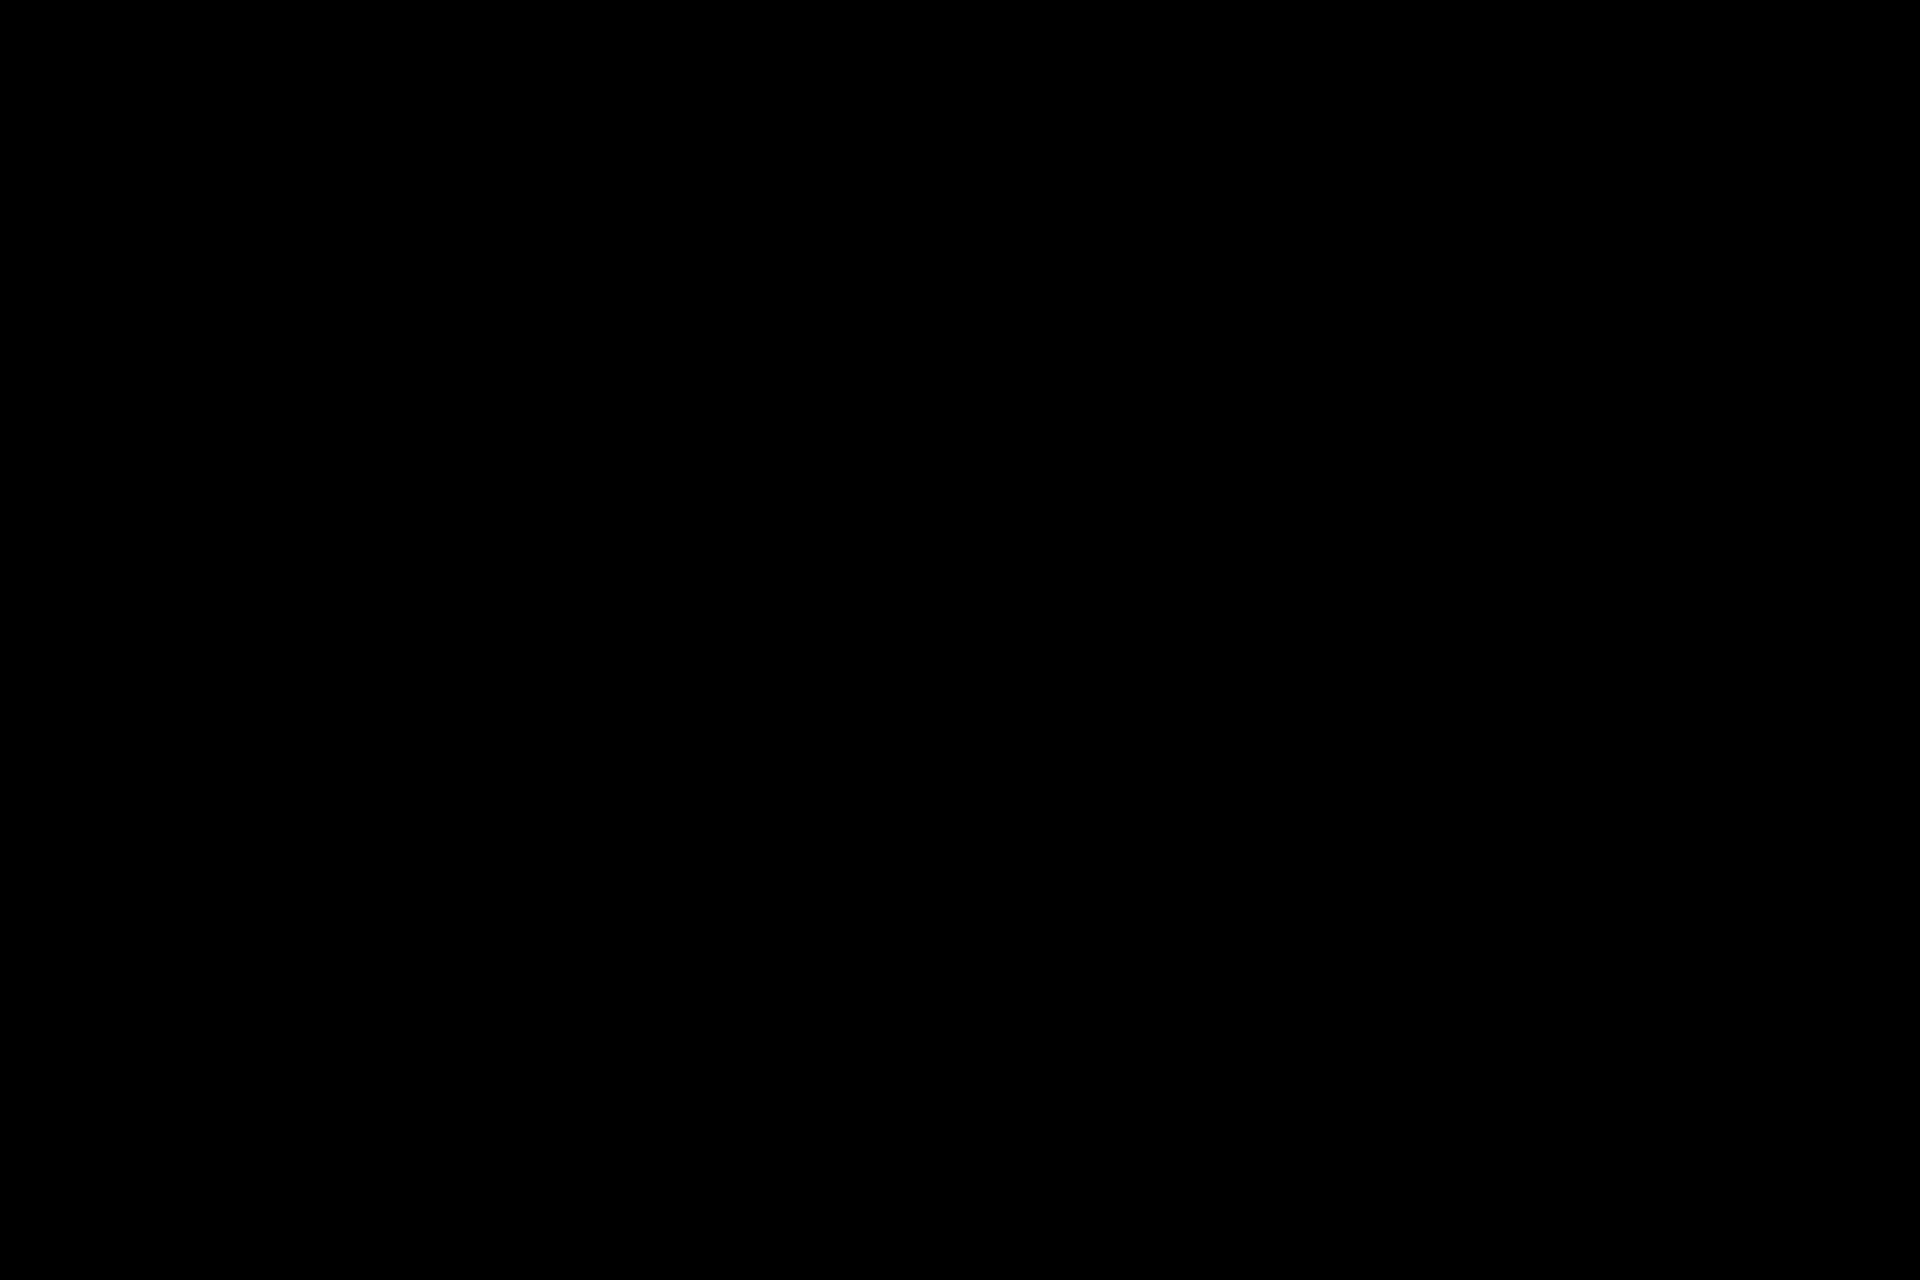 img_8767